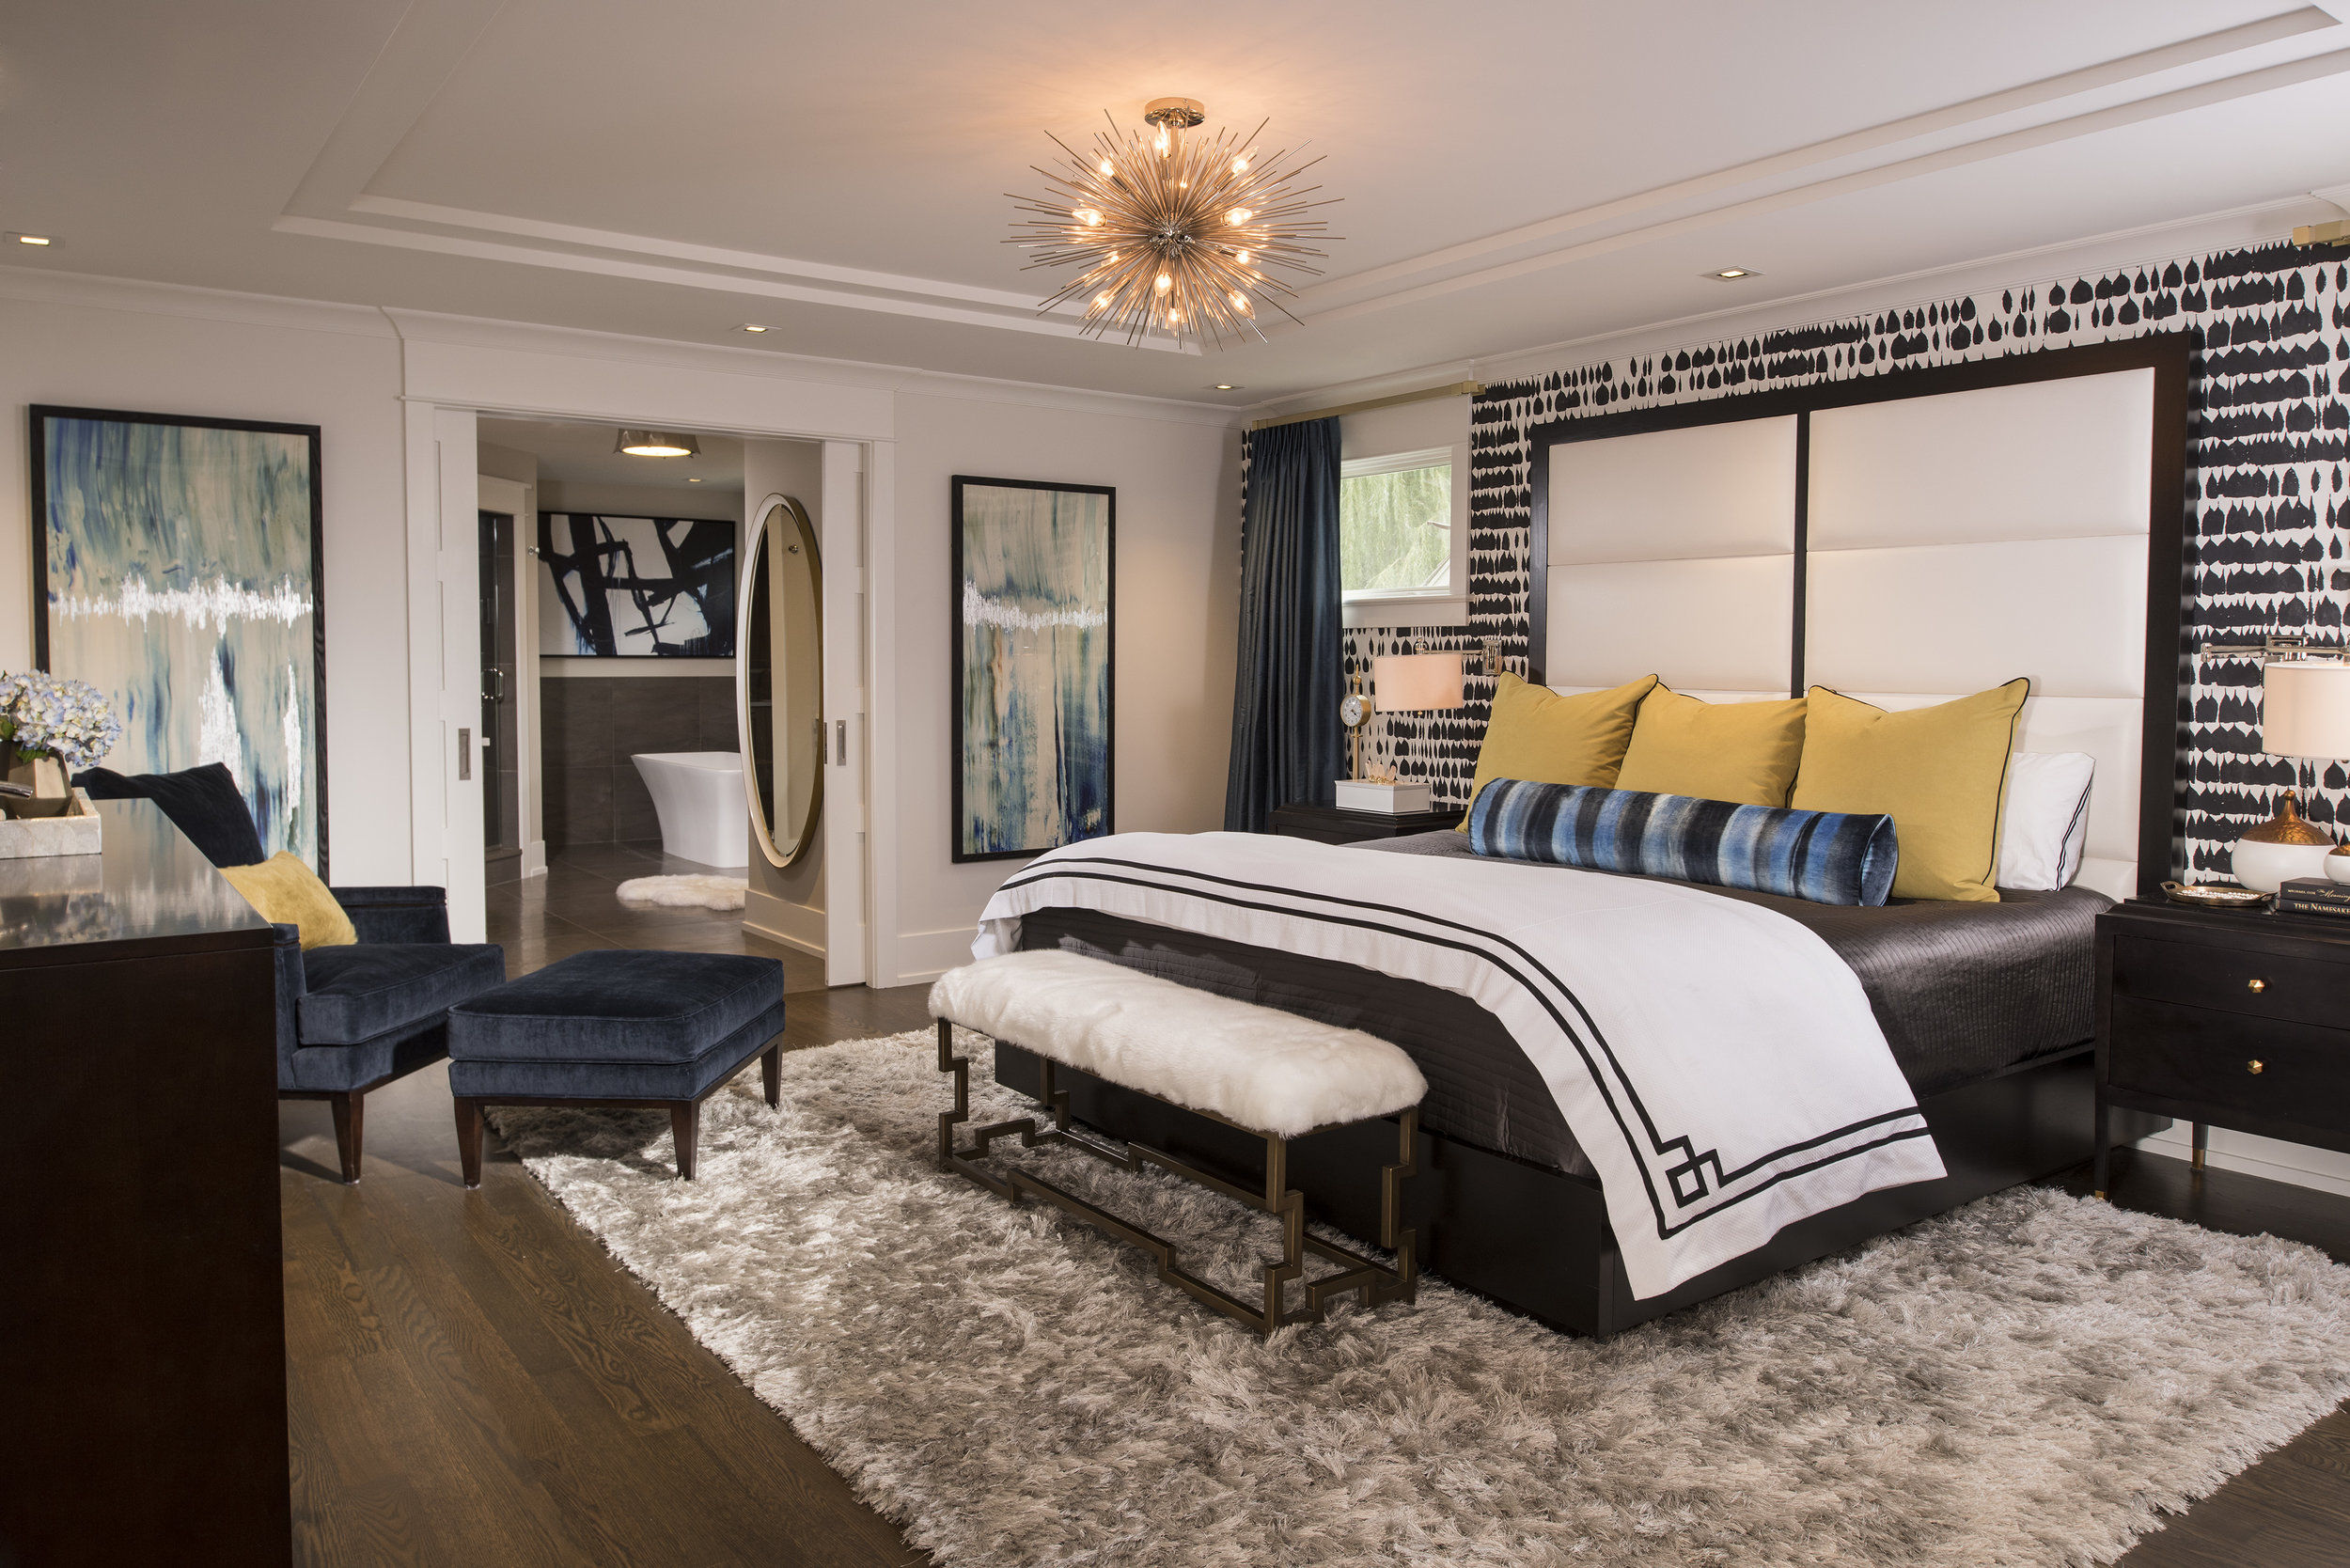 pin home contemporary decor pushelberg tips master yabu design best amazing designers top ideas interior bedroom